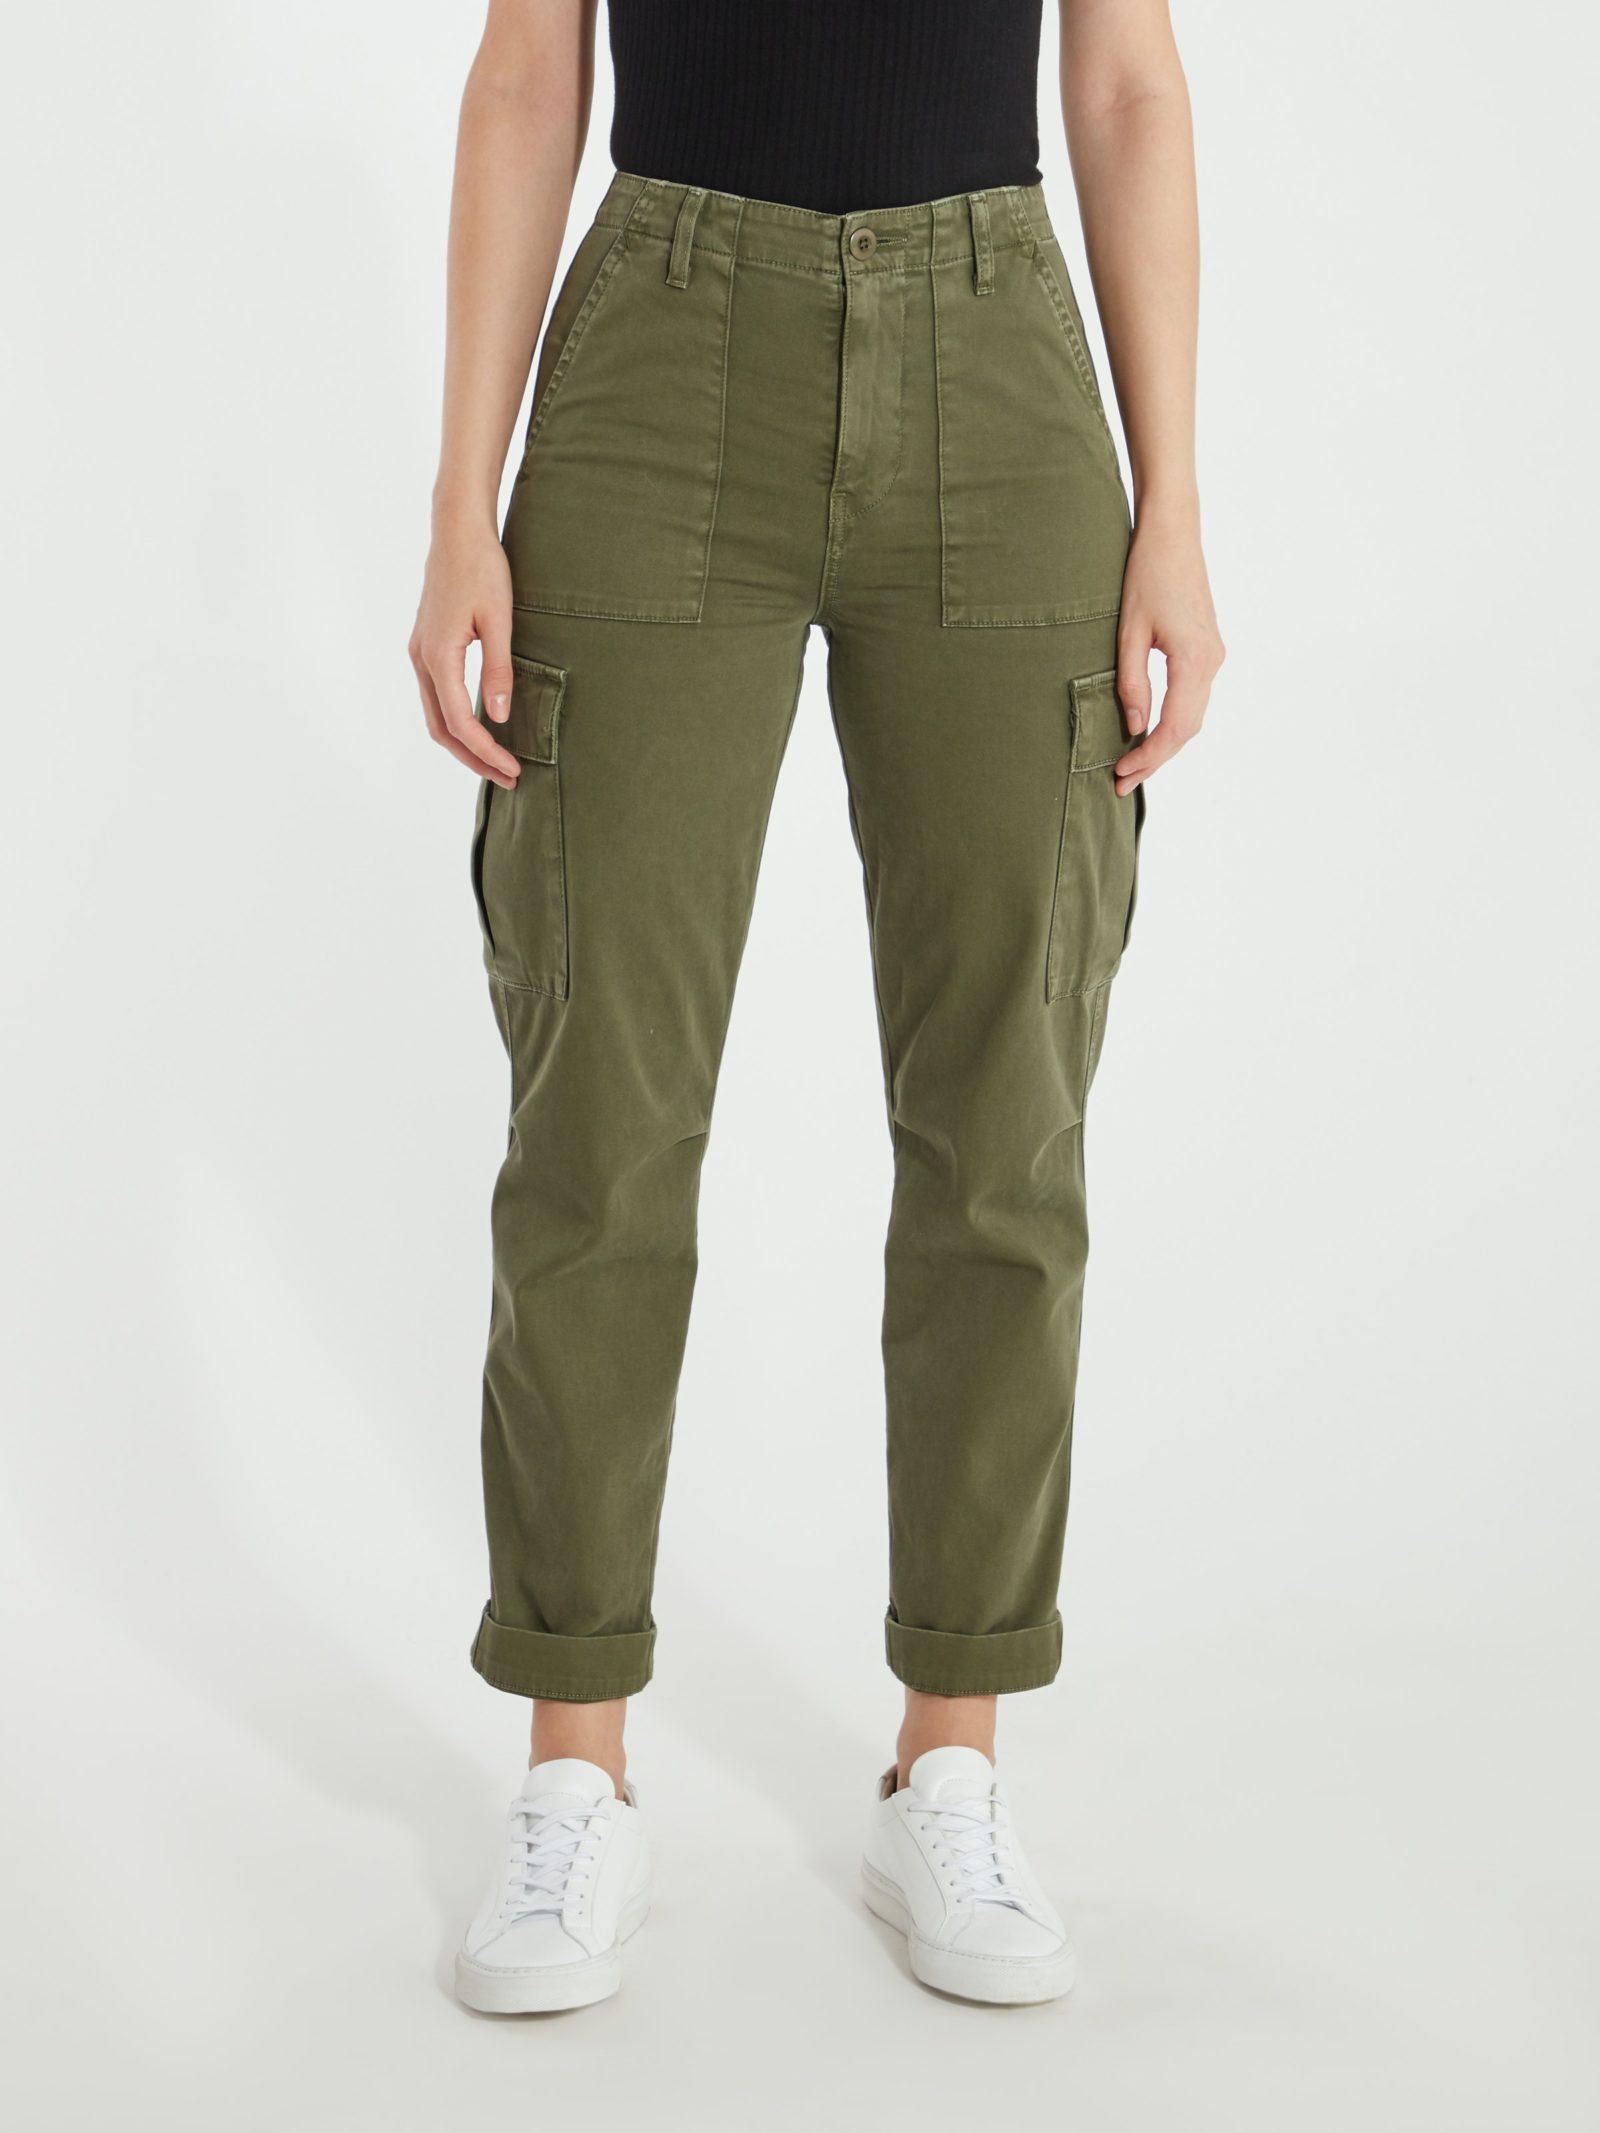 Verishop's Up To 80% Off Sale pants